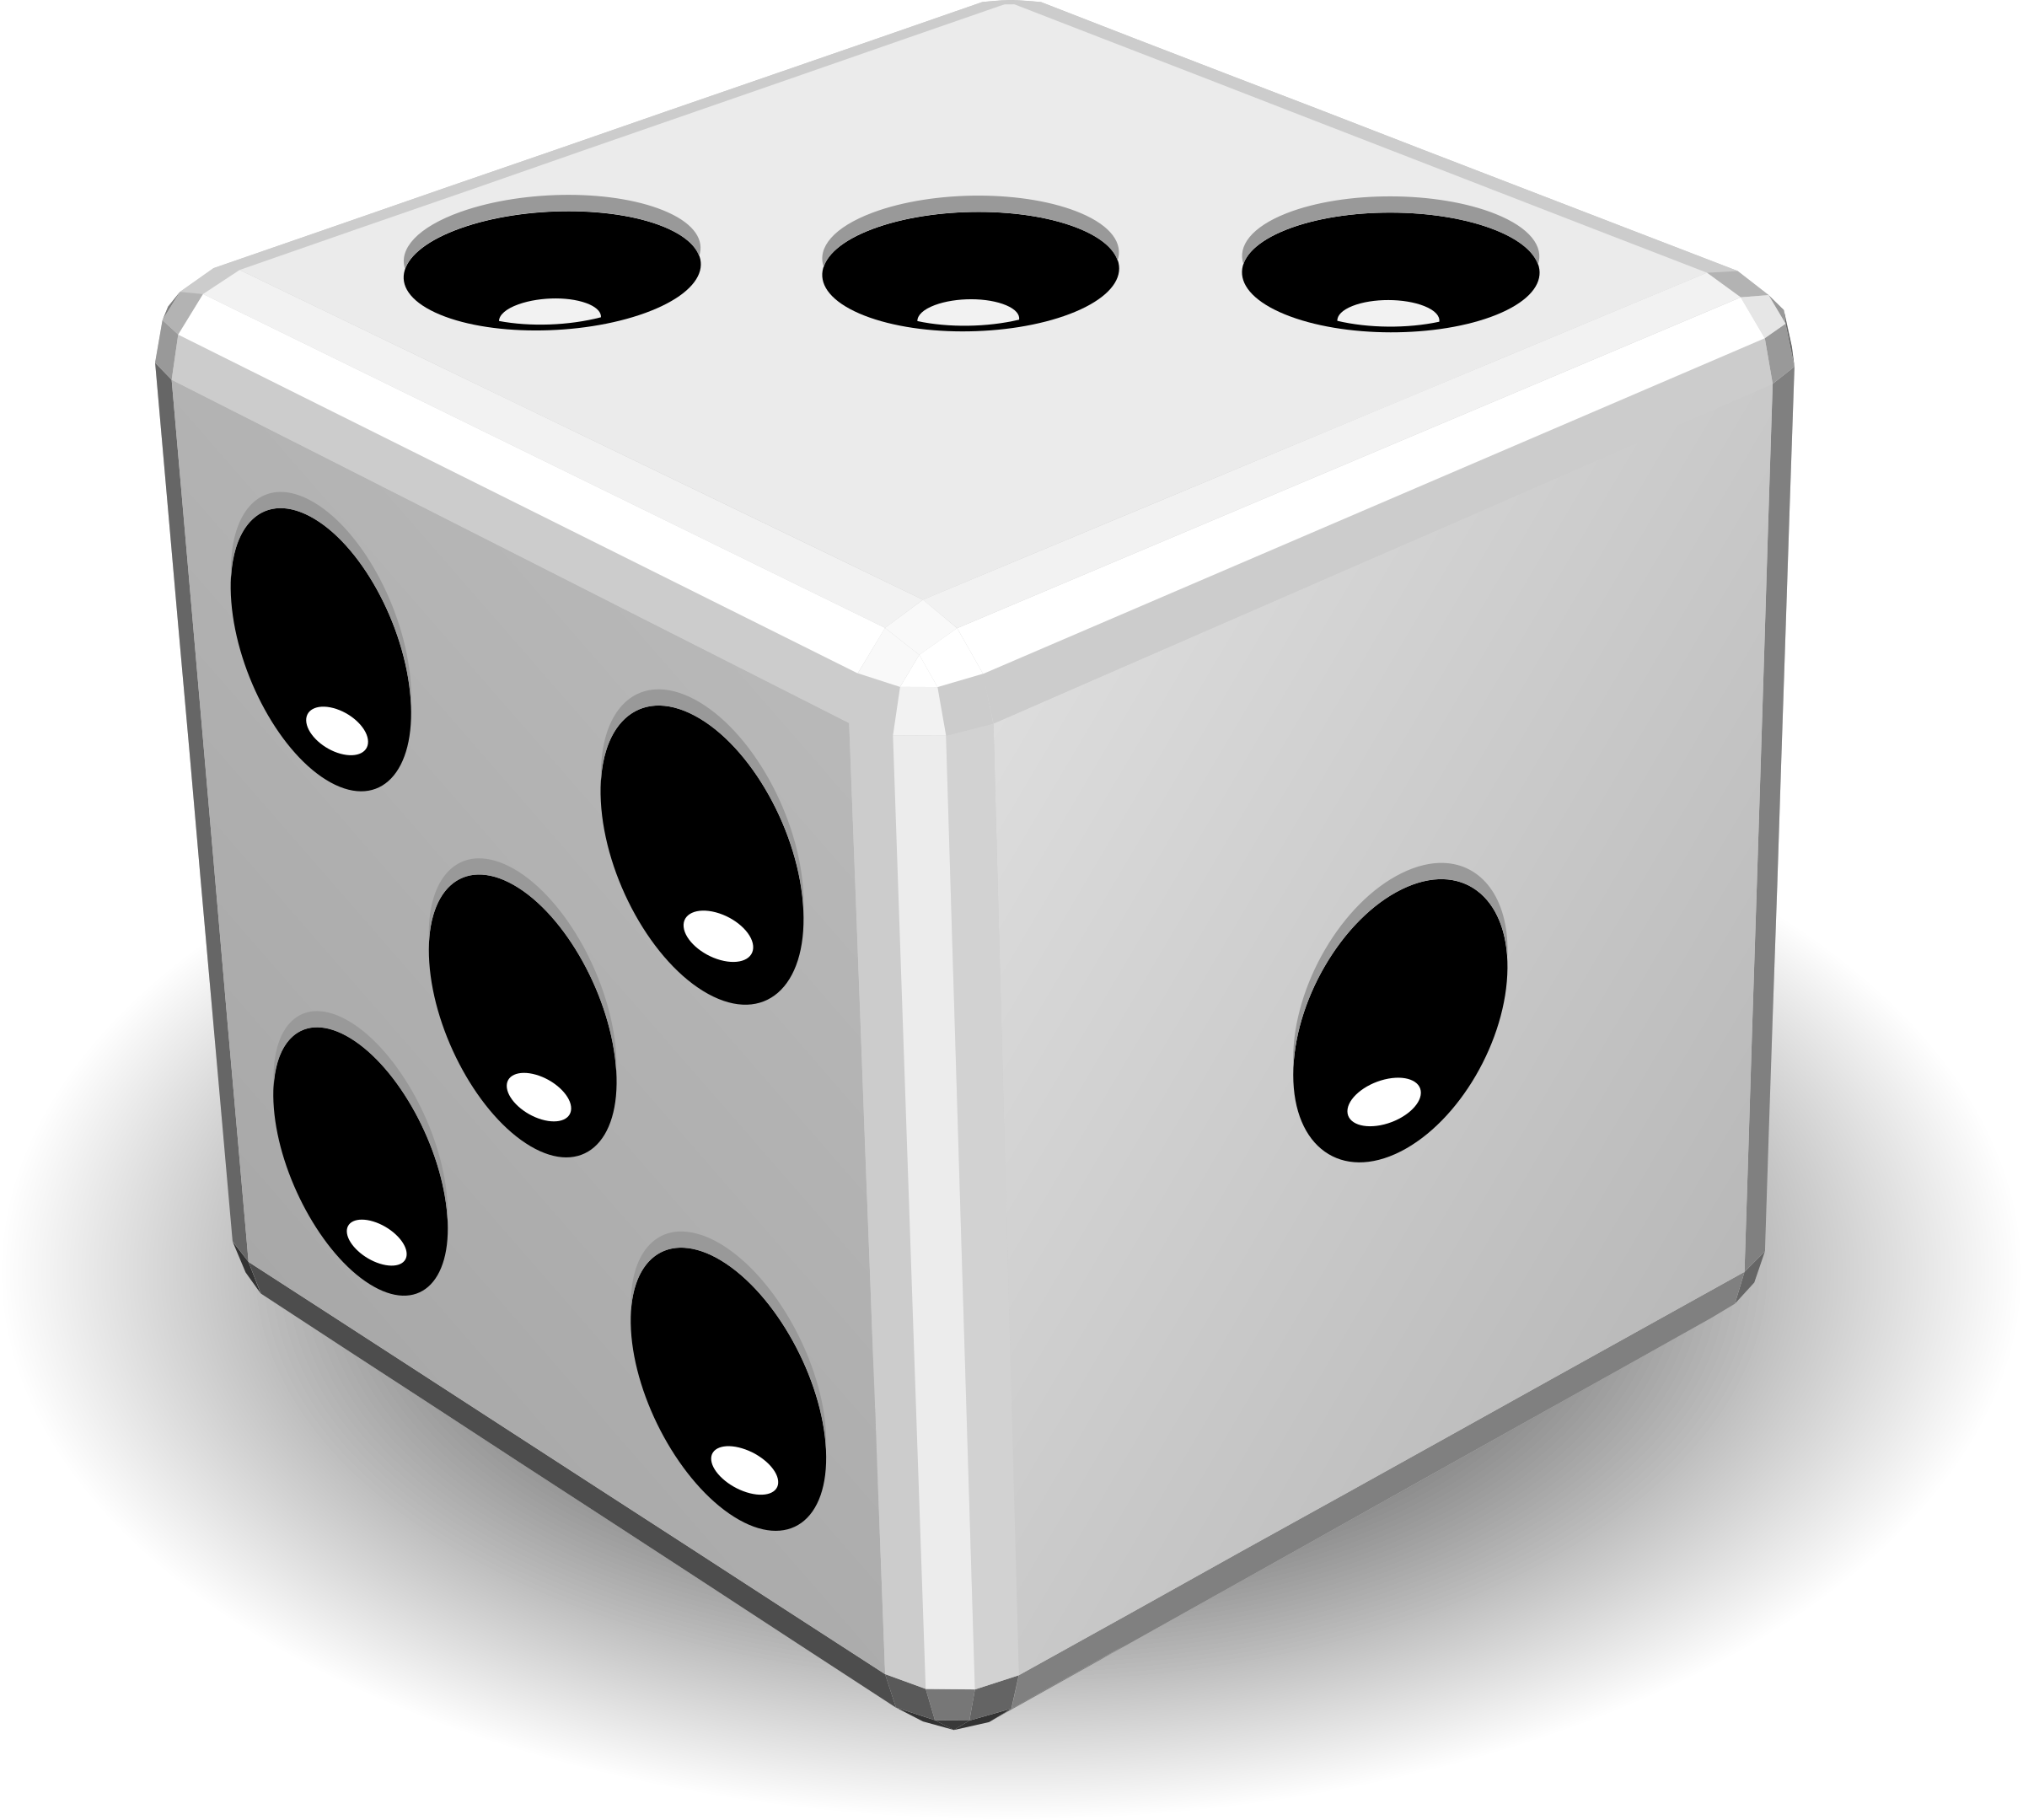 Dice clipart 3d dice, Dice 3d dice Transparent FREE for.